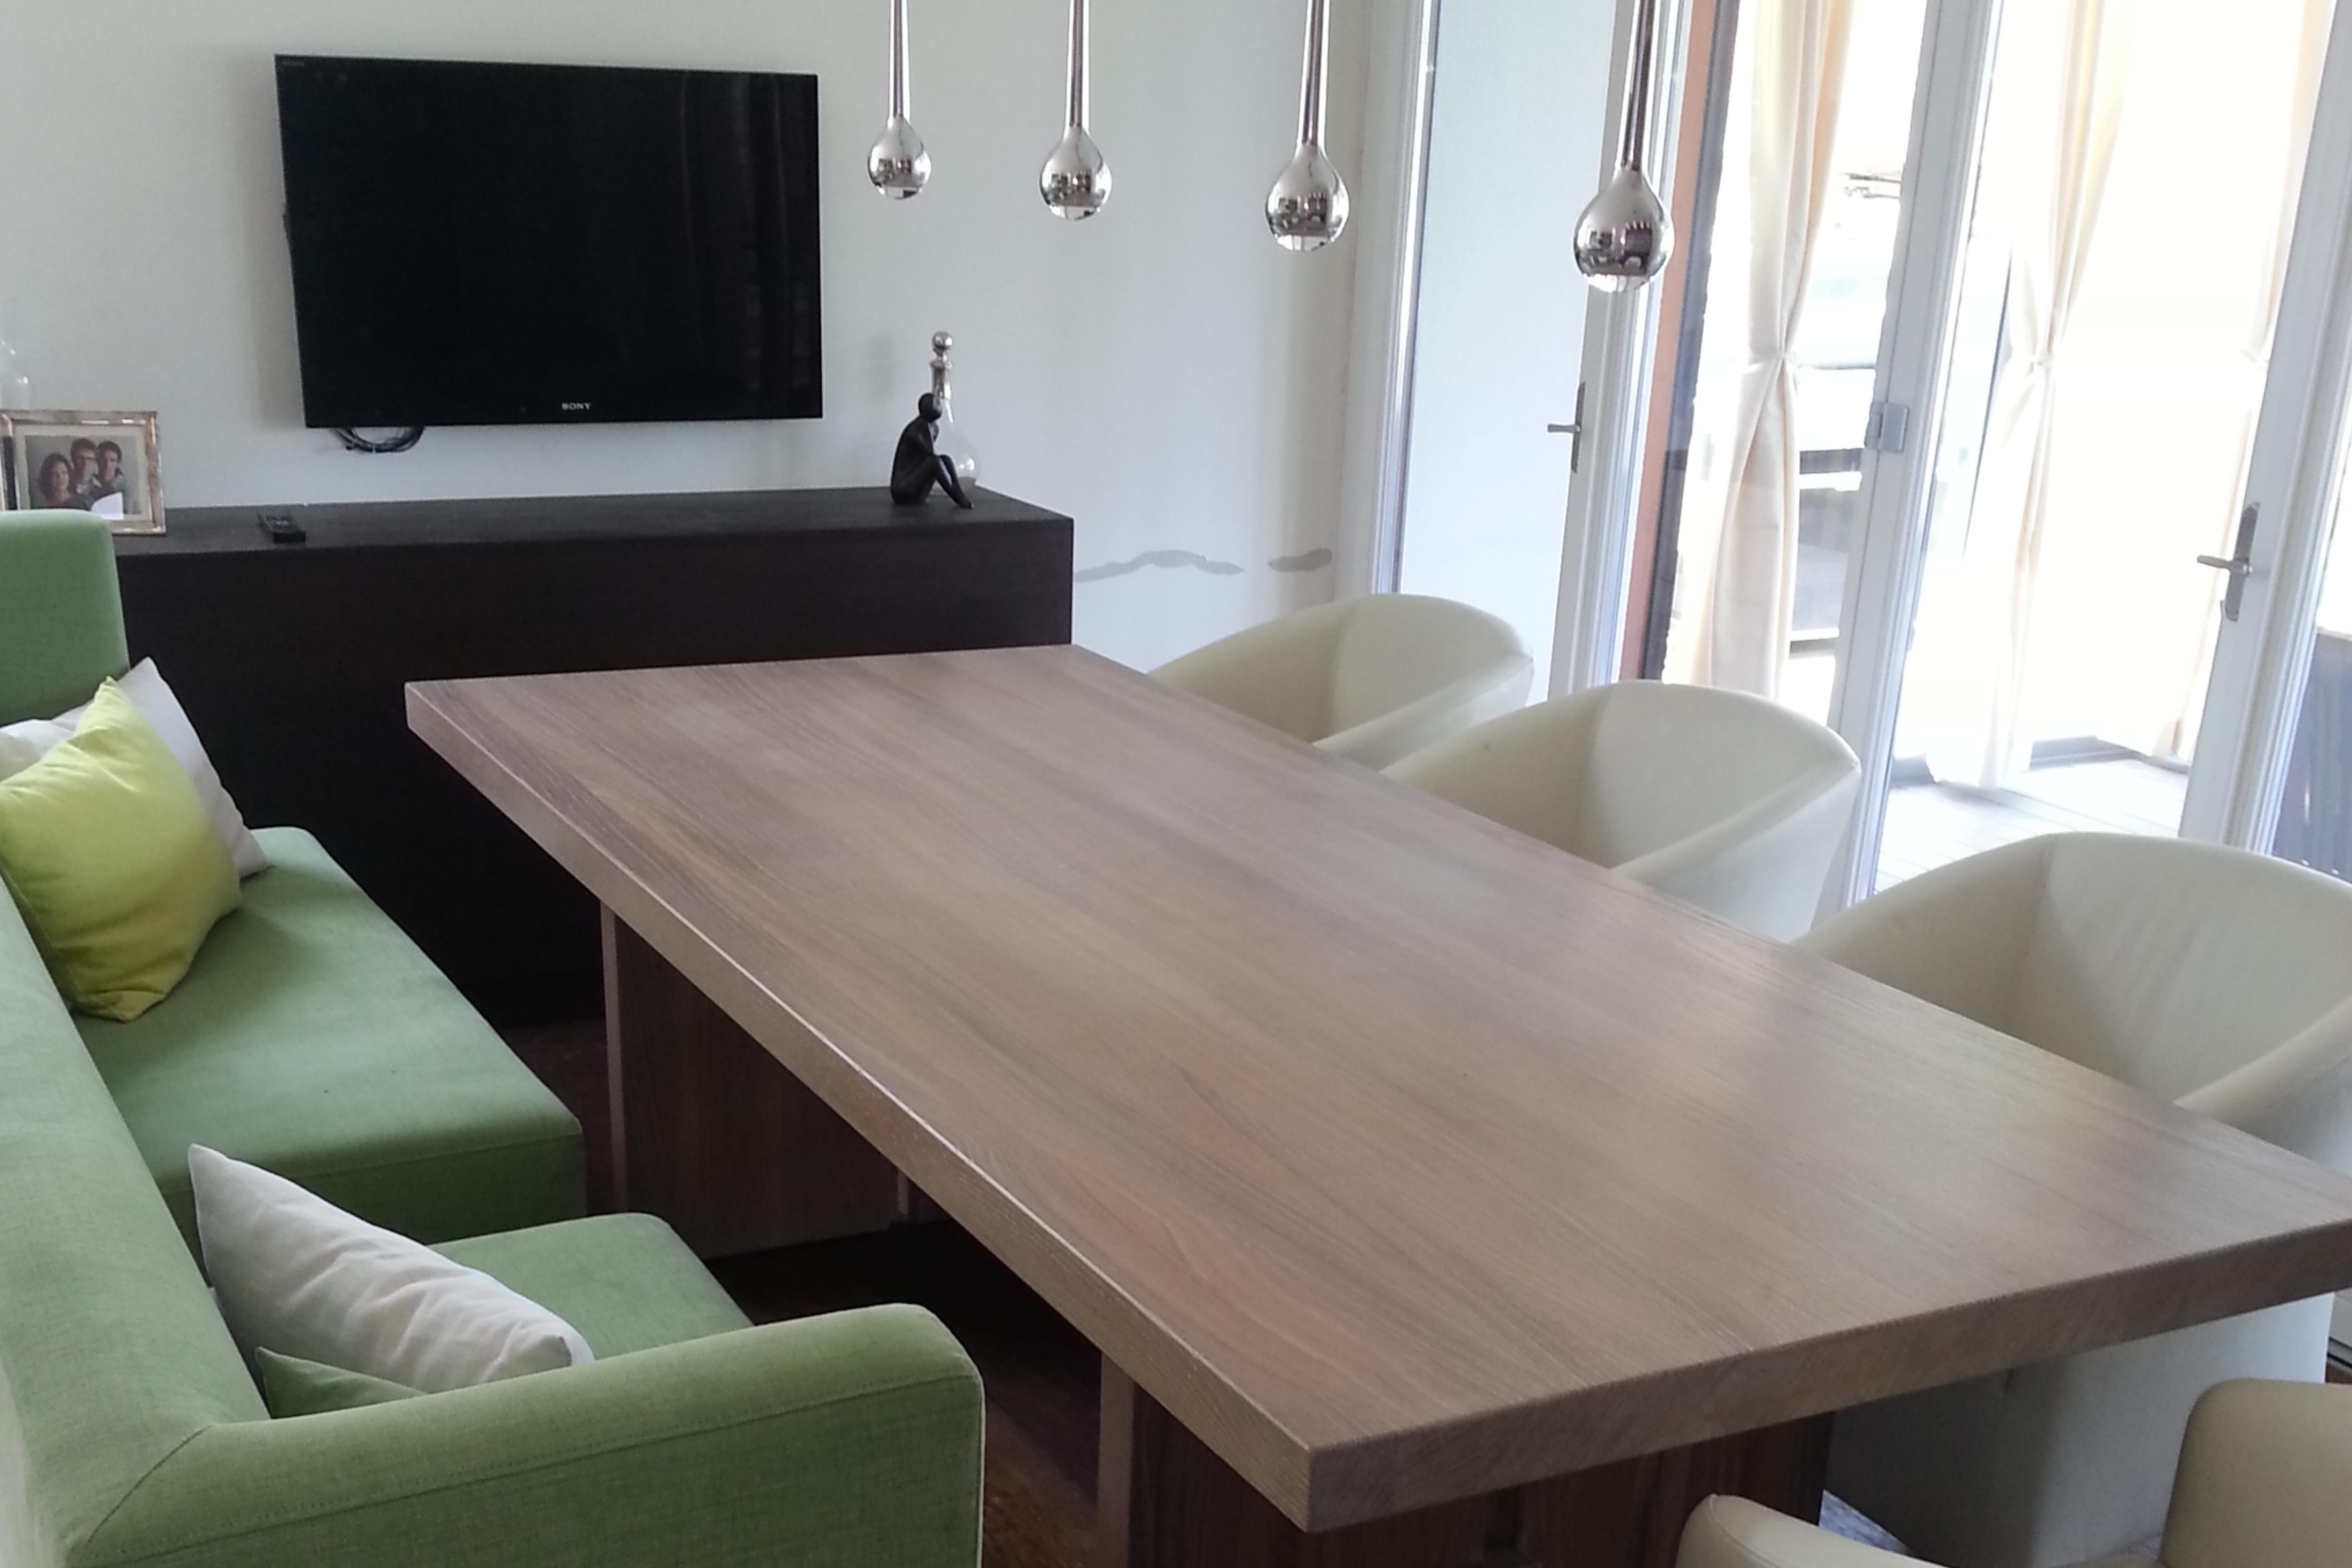 m bel aus zirbenholz tischler manfred strantz burgenland. Black Bedroom Furniture Sets. Home Design Ideas